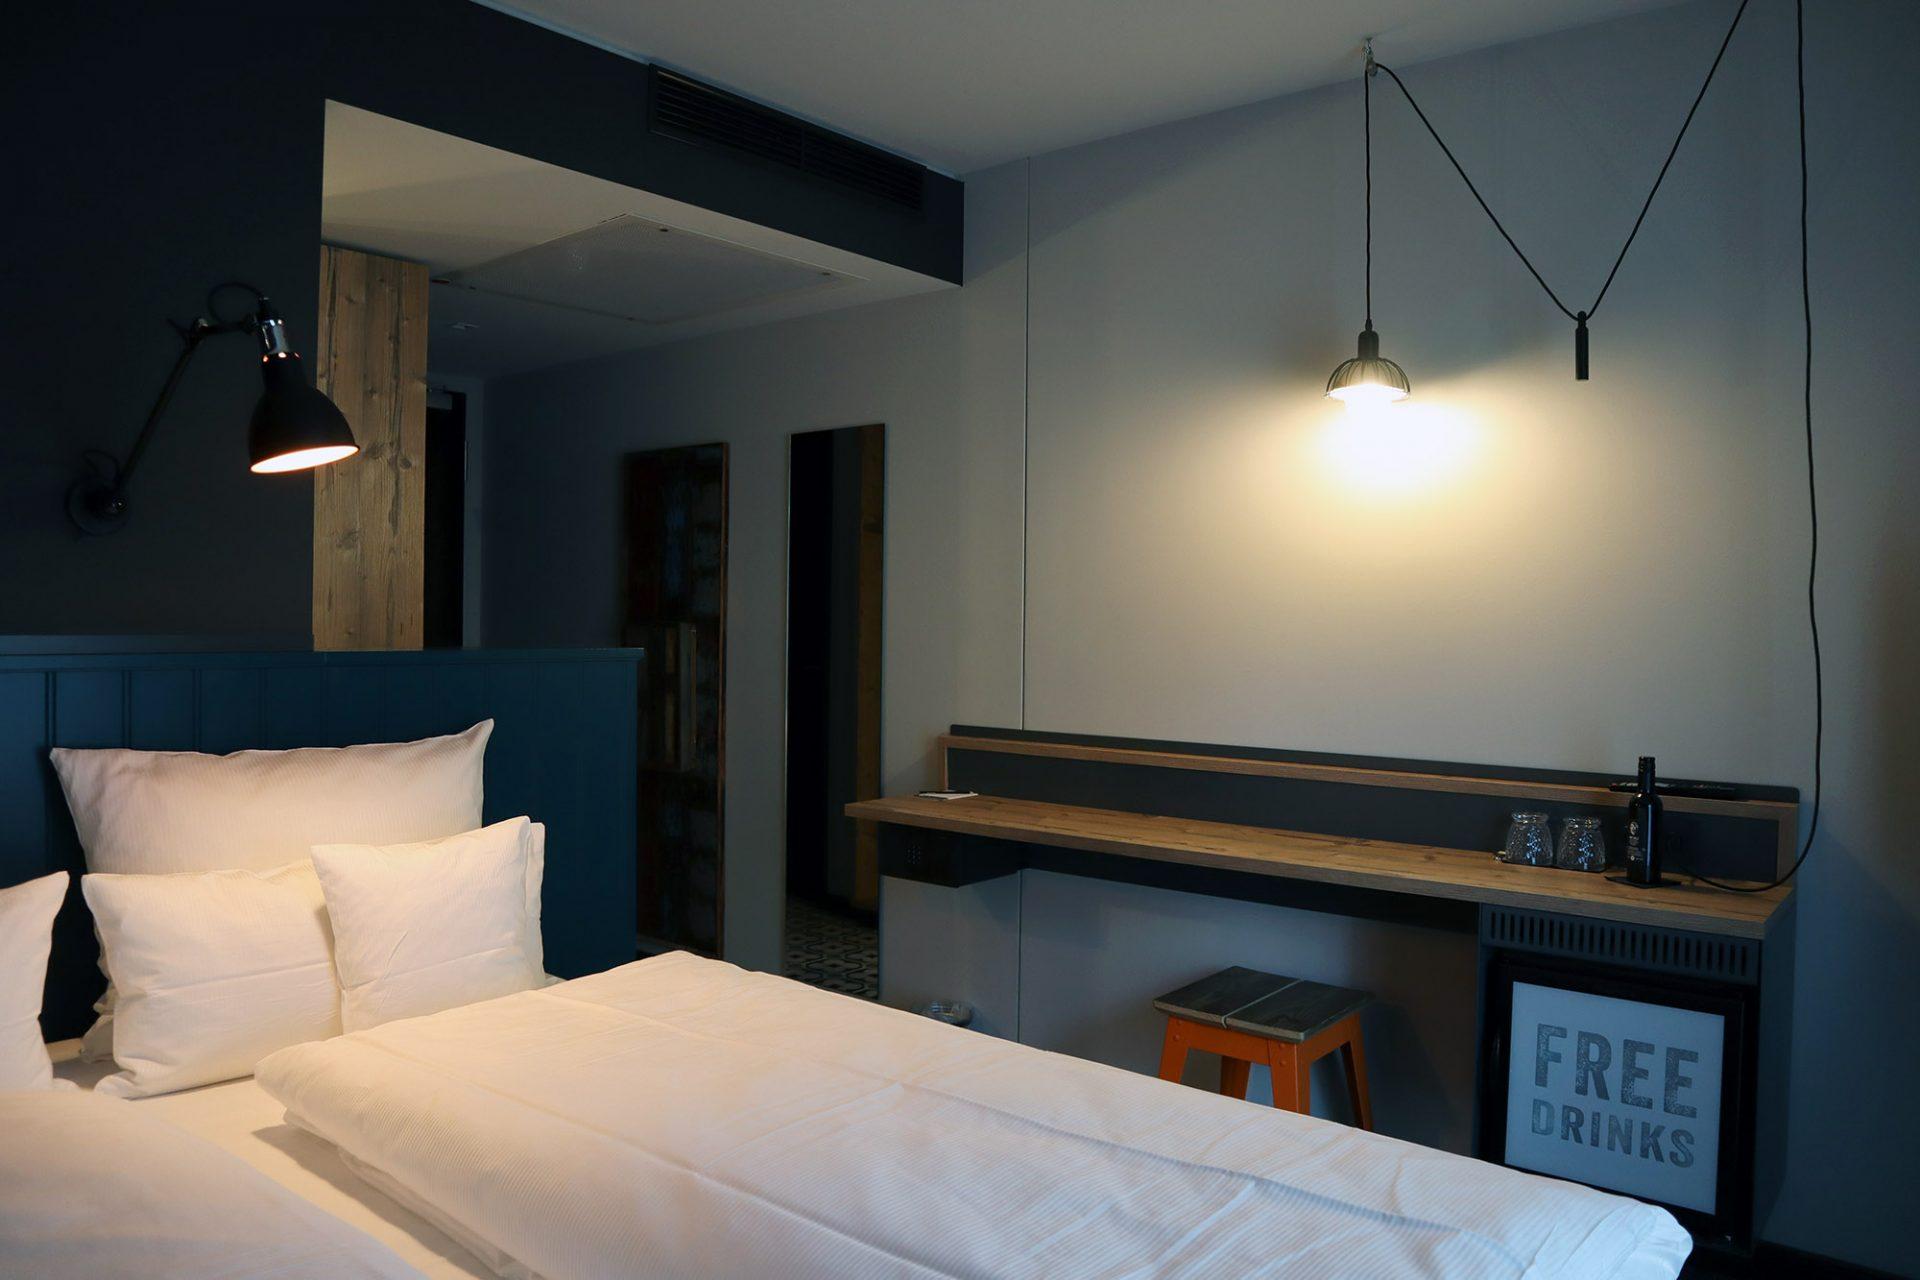 """me and all hotel mainz"". ... sogenanntes ""Viele-Kissen-Konzept"" in dem ..."